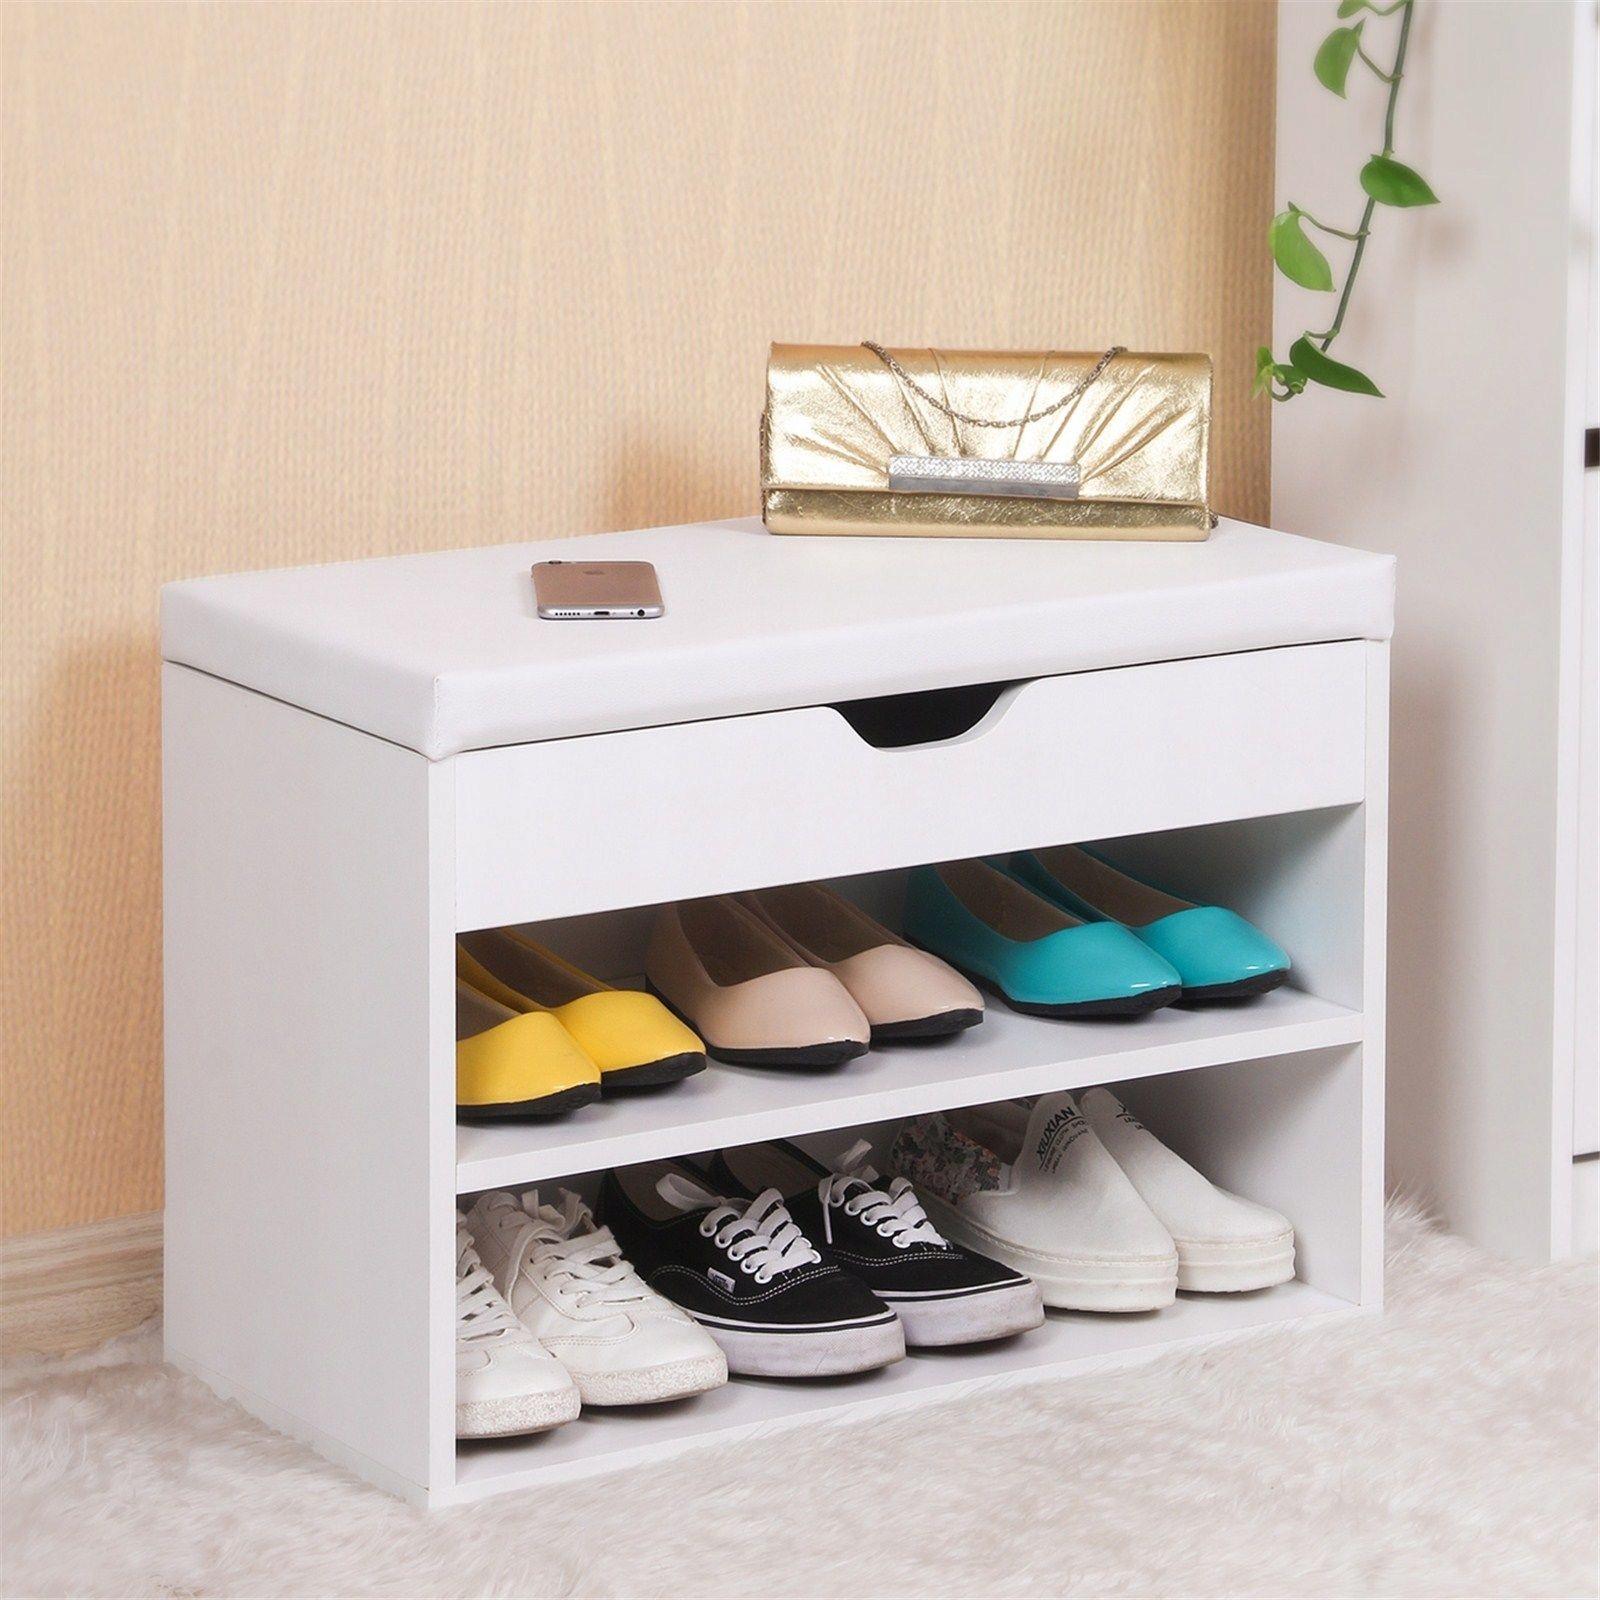 Topánky stojan s sedadla box farba biela